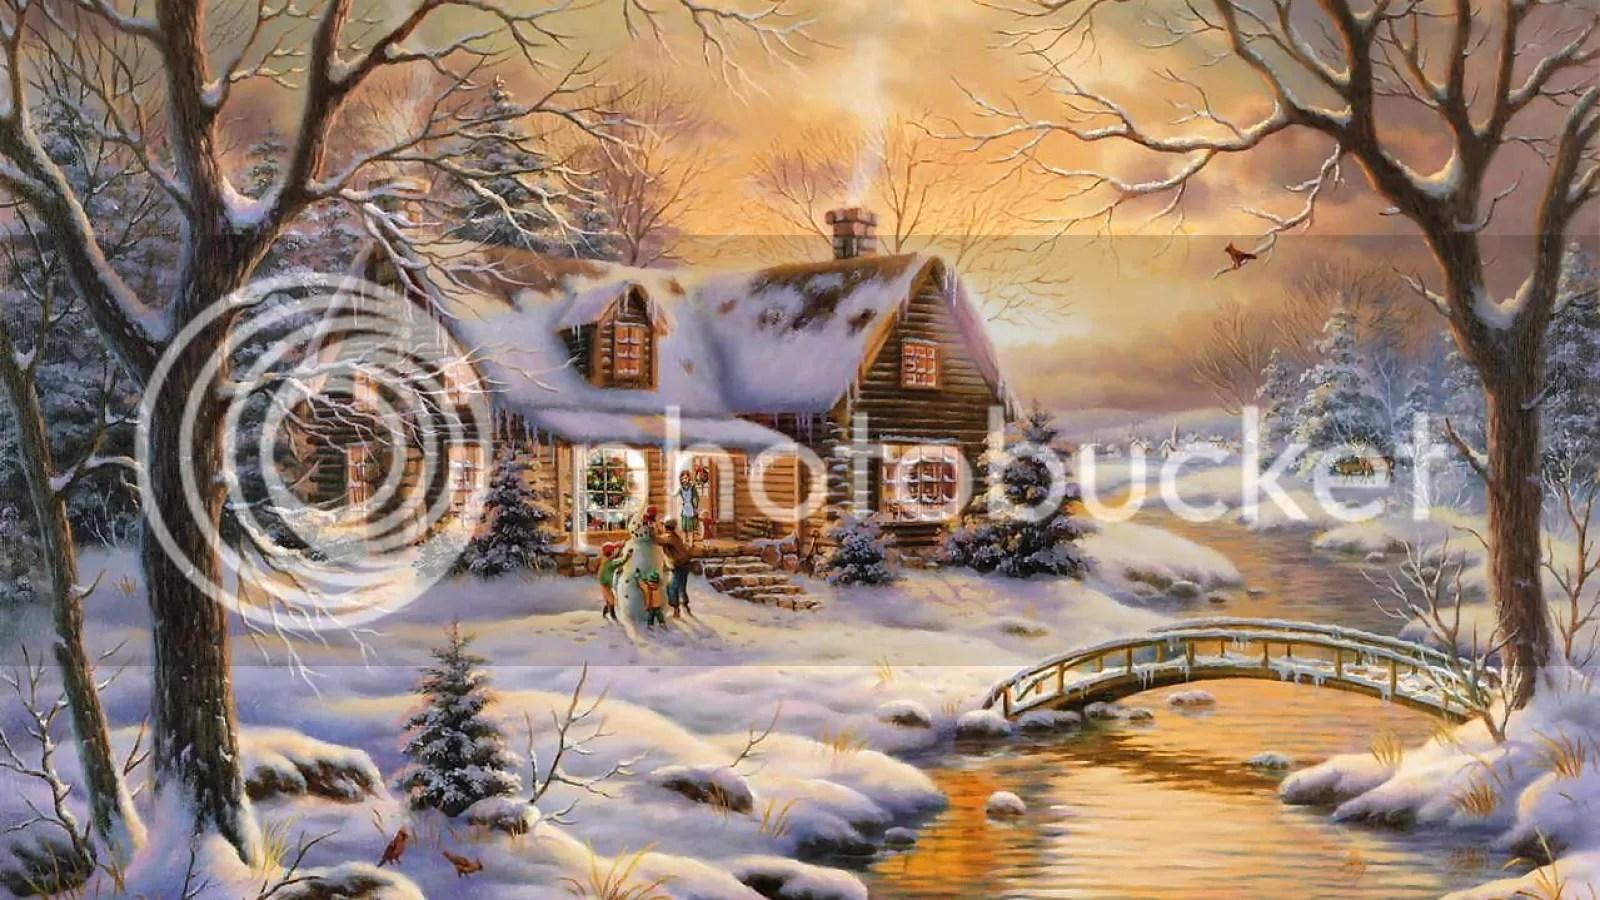 photo Christmas_zpspdcsqcdi.jpg